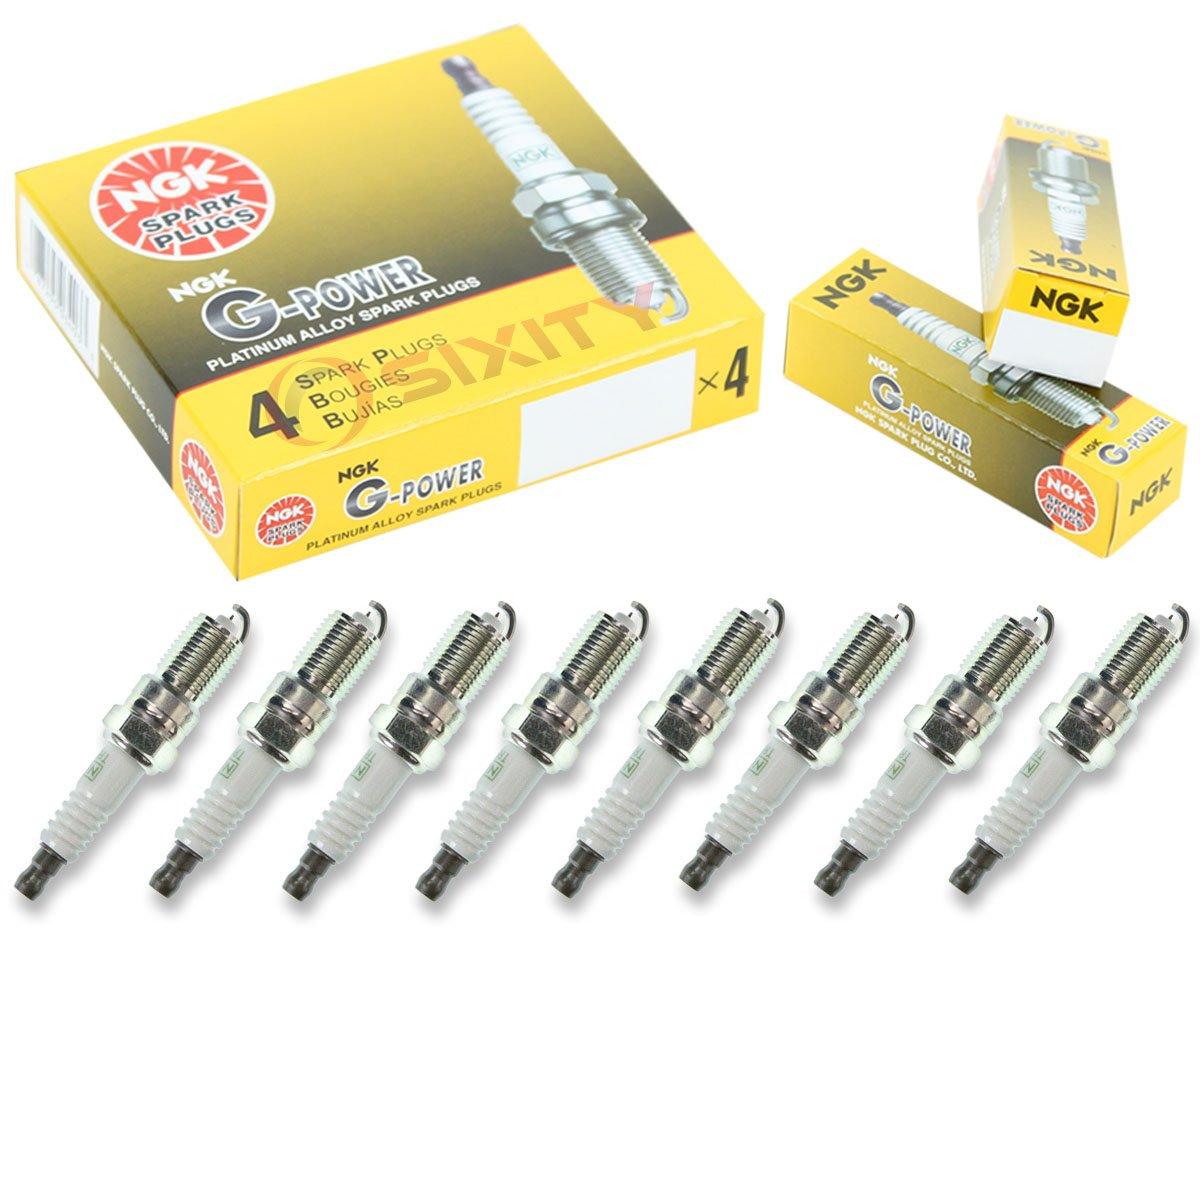 Amazon.com: NGK G-Power 8pcs Spark Plugs Ford F-150 93-10 5.8L R CNG 5.4L M 4.6L V8 VIN: Automotive